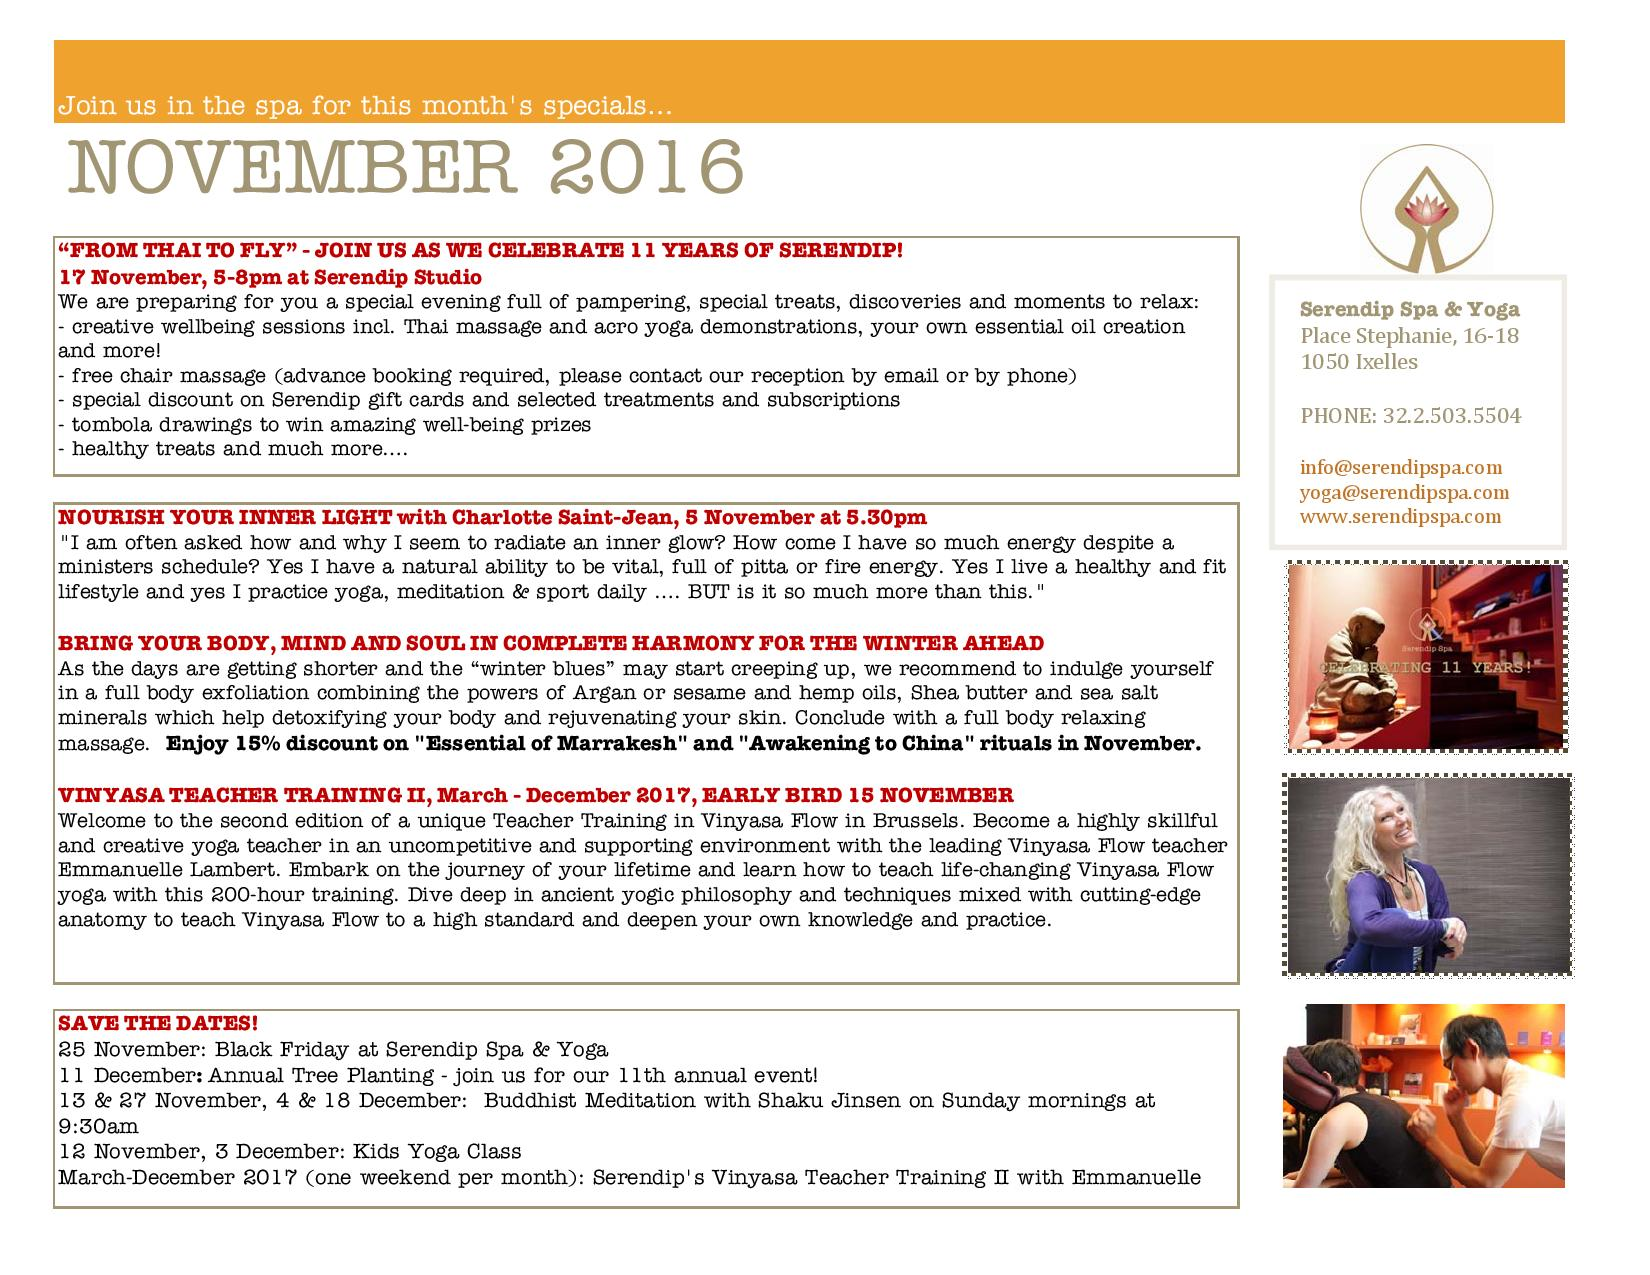 Serendip Spa and Yoga Calendar 2016_November A4 BACK-page-001.jpg